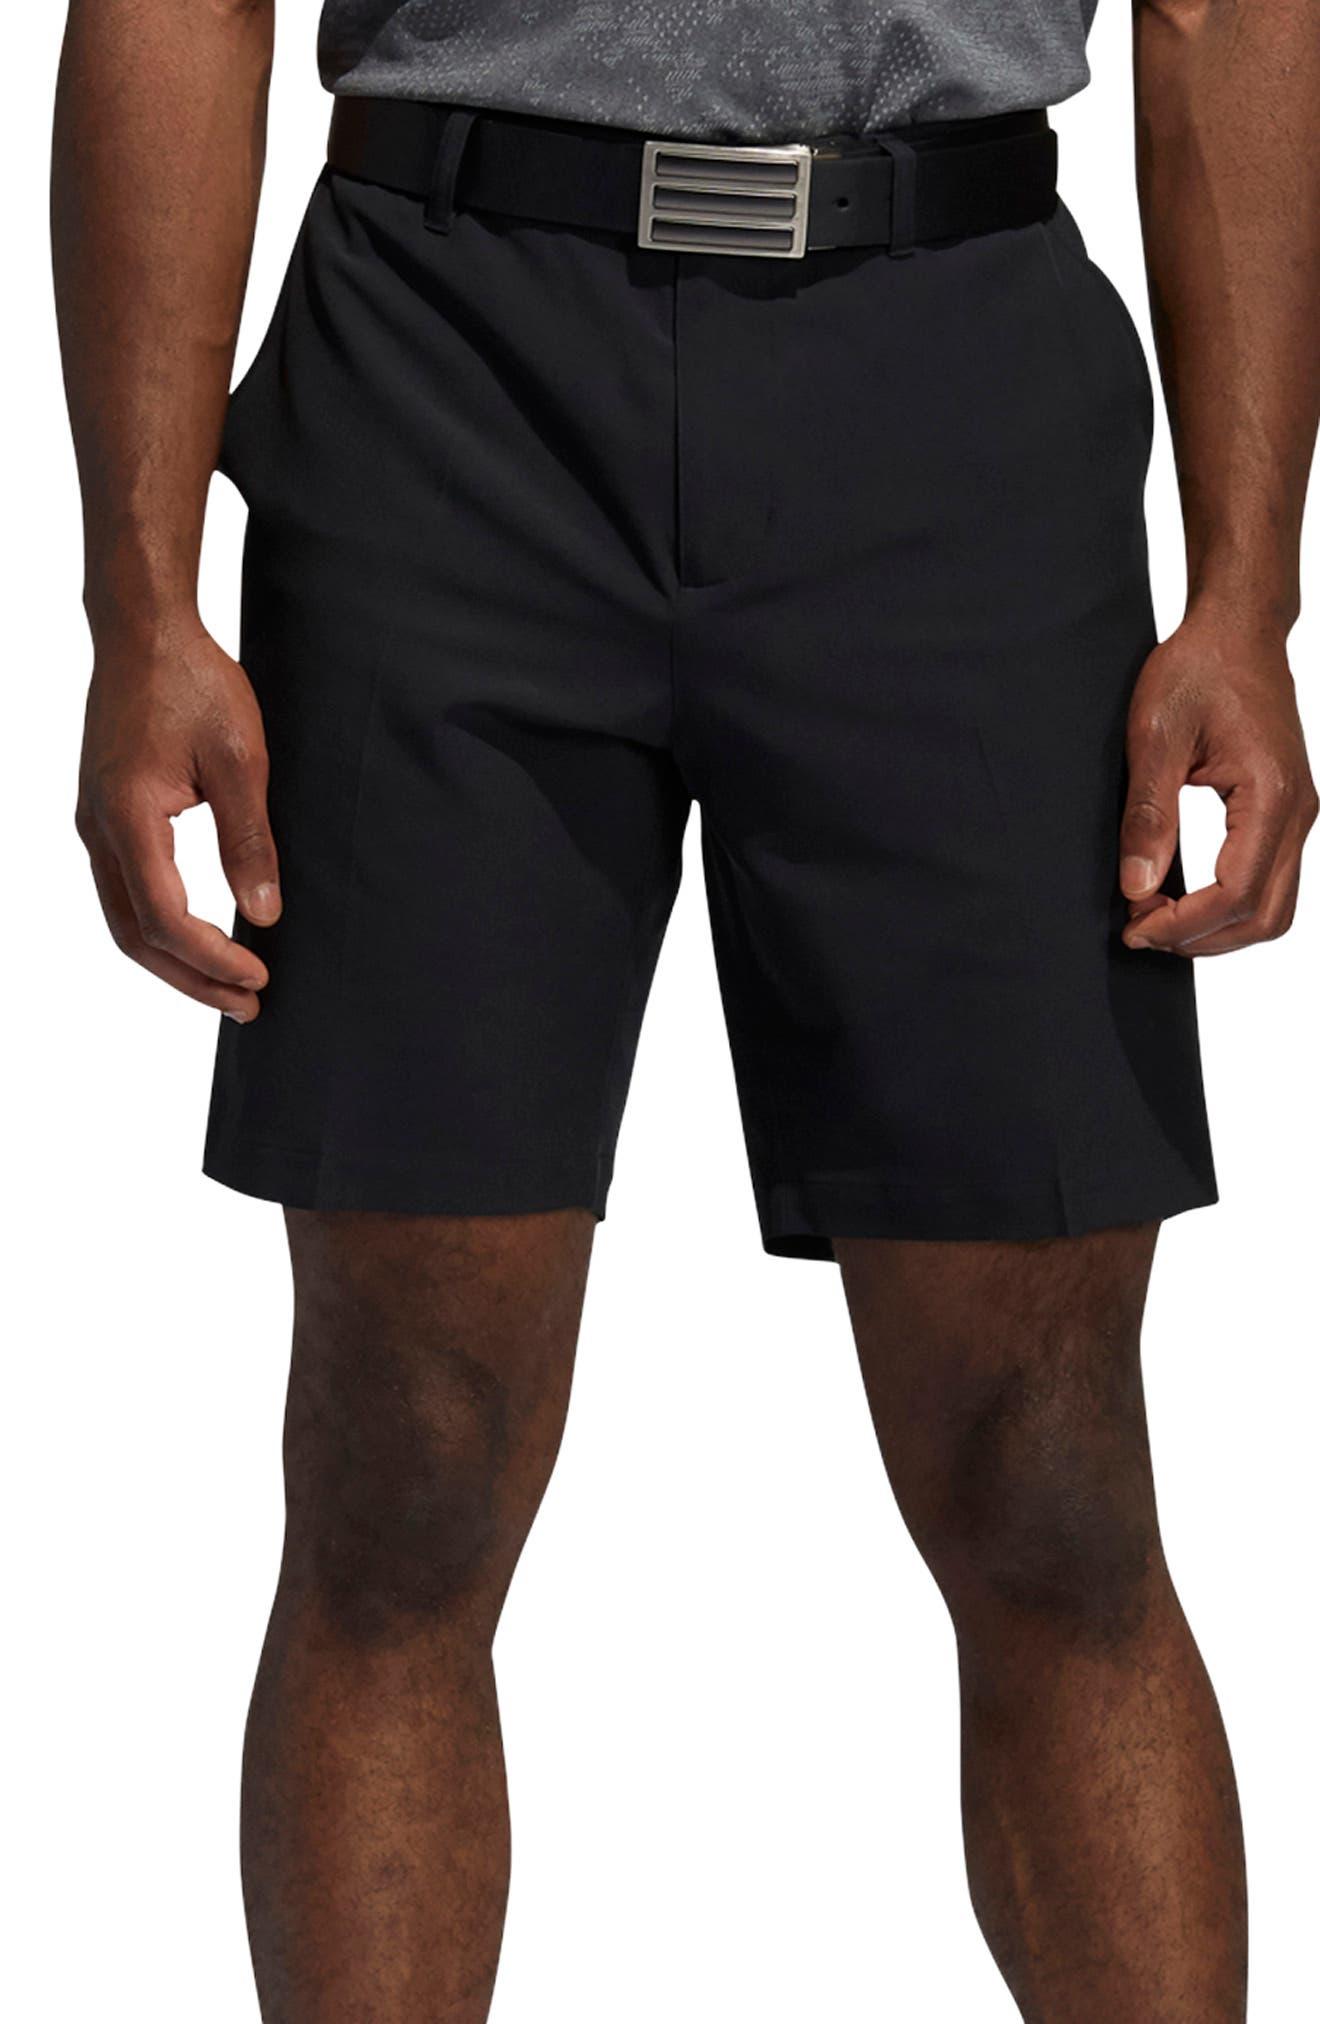 Men's Adidas Golf Men's Ultimate 365 Perfomance Shorts